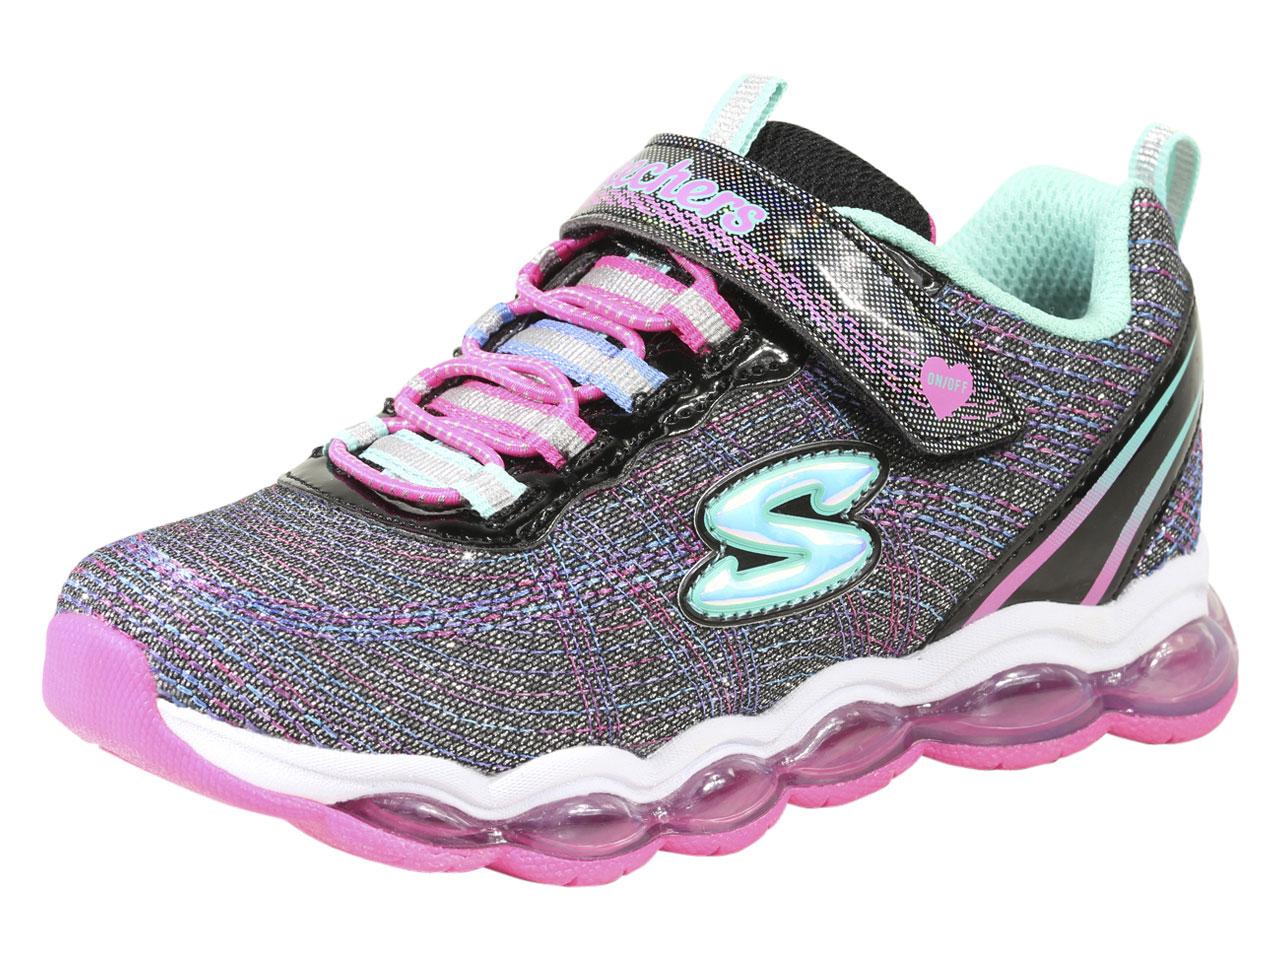 Details Blackmulti Light Up Shoes Lights Glimmer Sneakers Skechers Little Girl's Sz2 About jL543cqAR